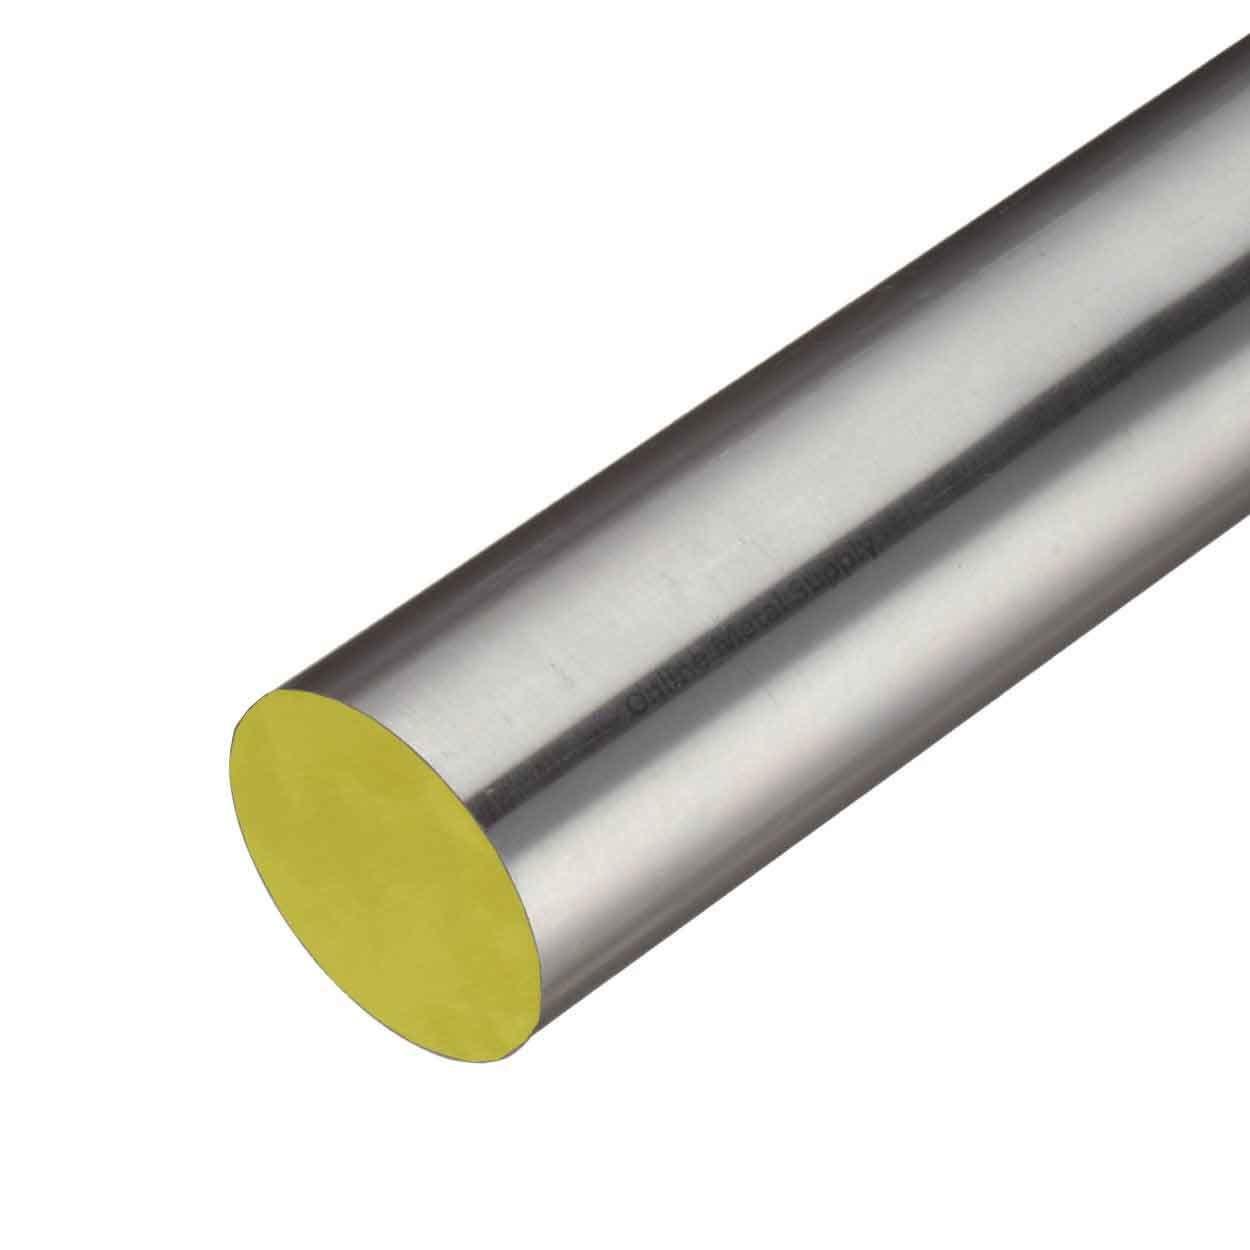 Online Metal Supply 316 Stainless Steel Round Rod, 2.500 (2-1/2 inch) x 6 inches by Online Metal Supply